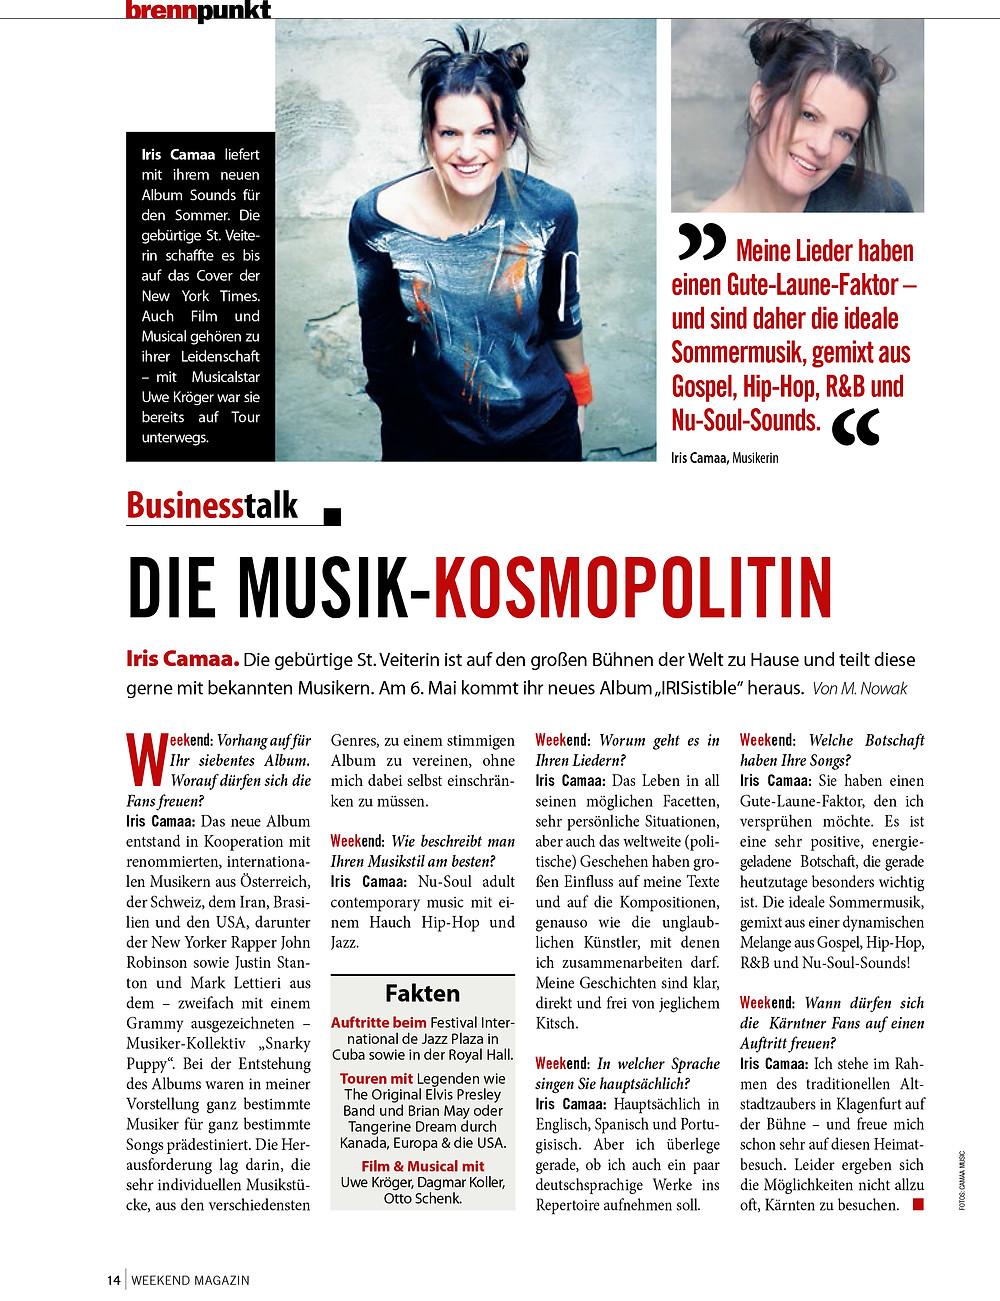 Iris Camaa die Musik-Kosmopolitin